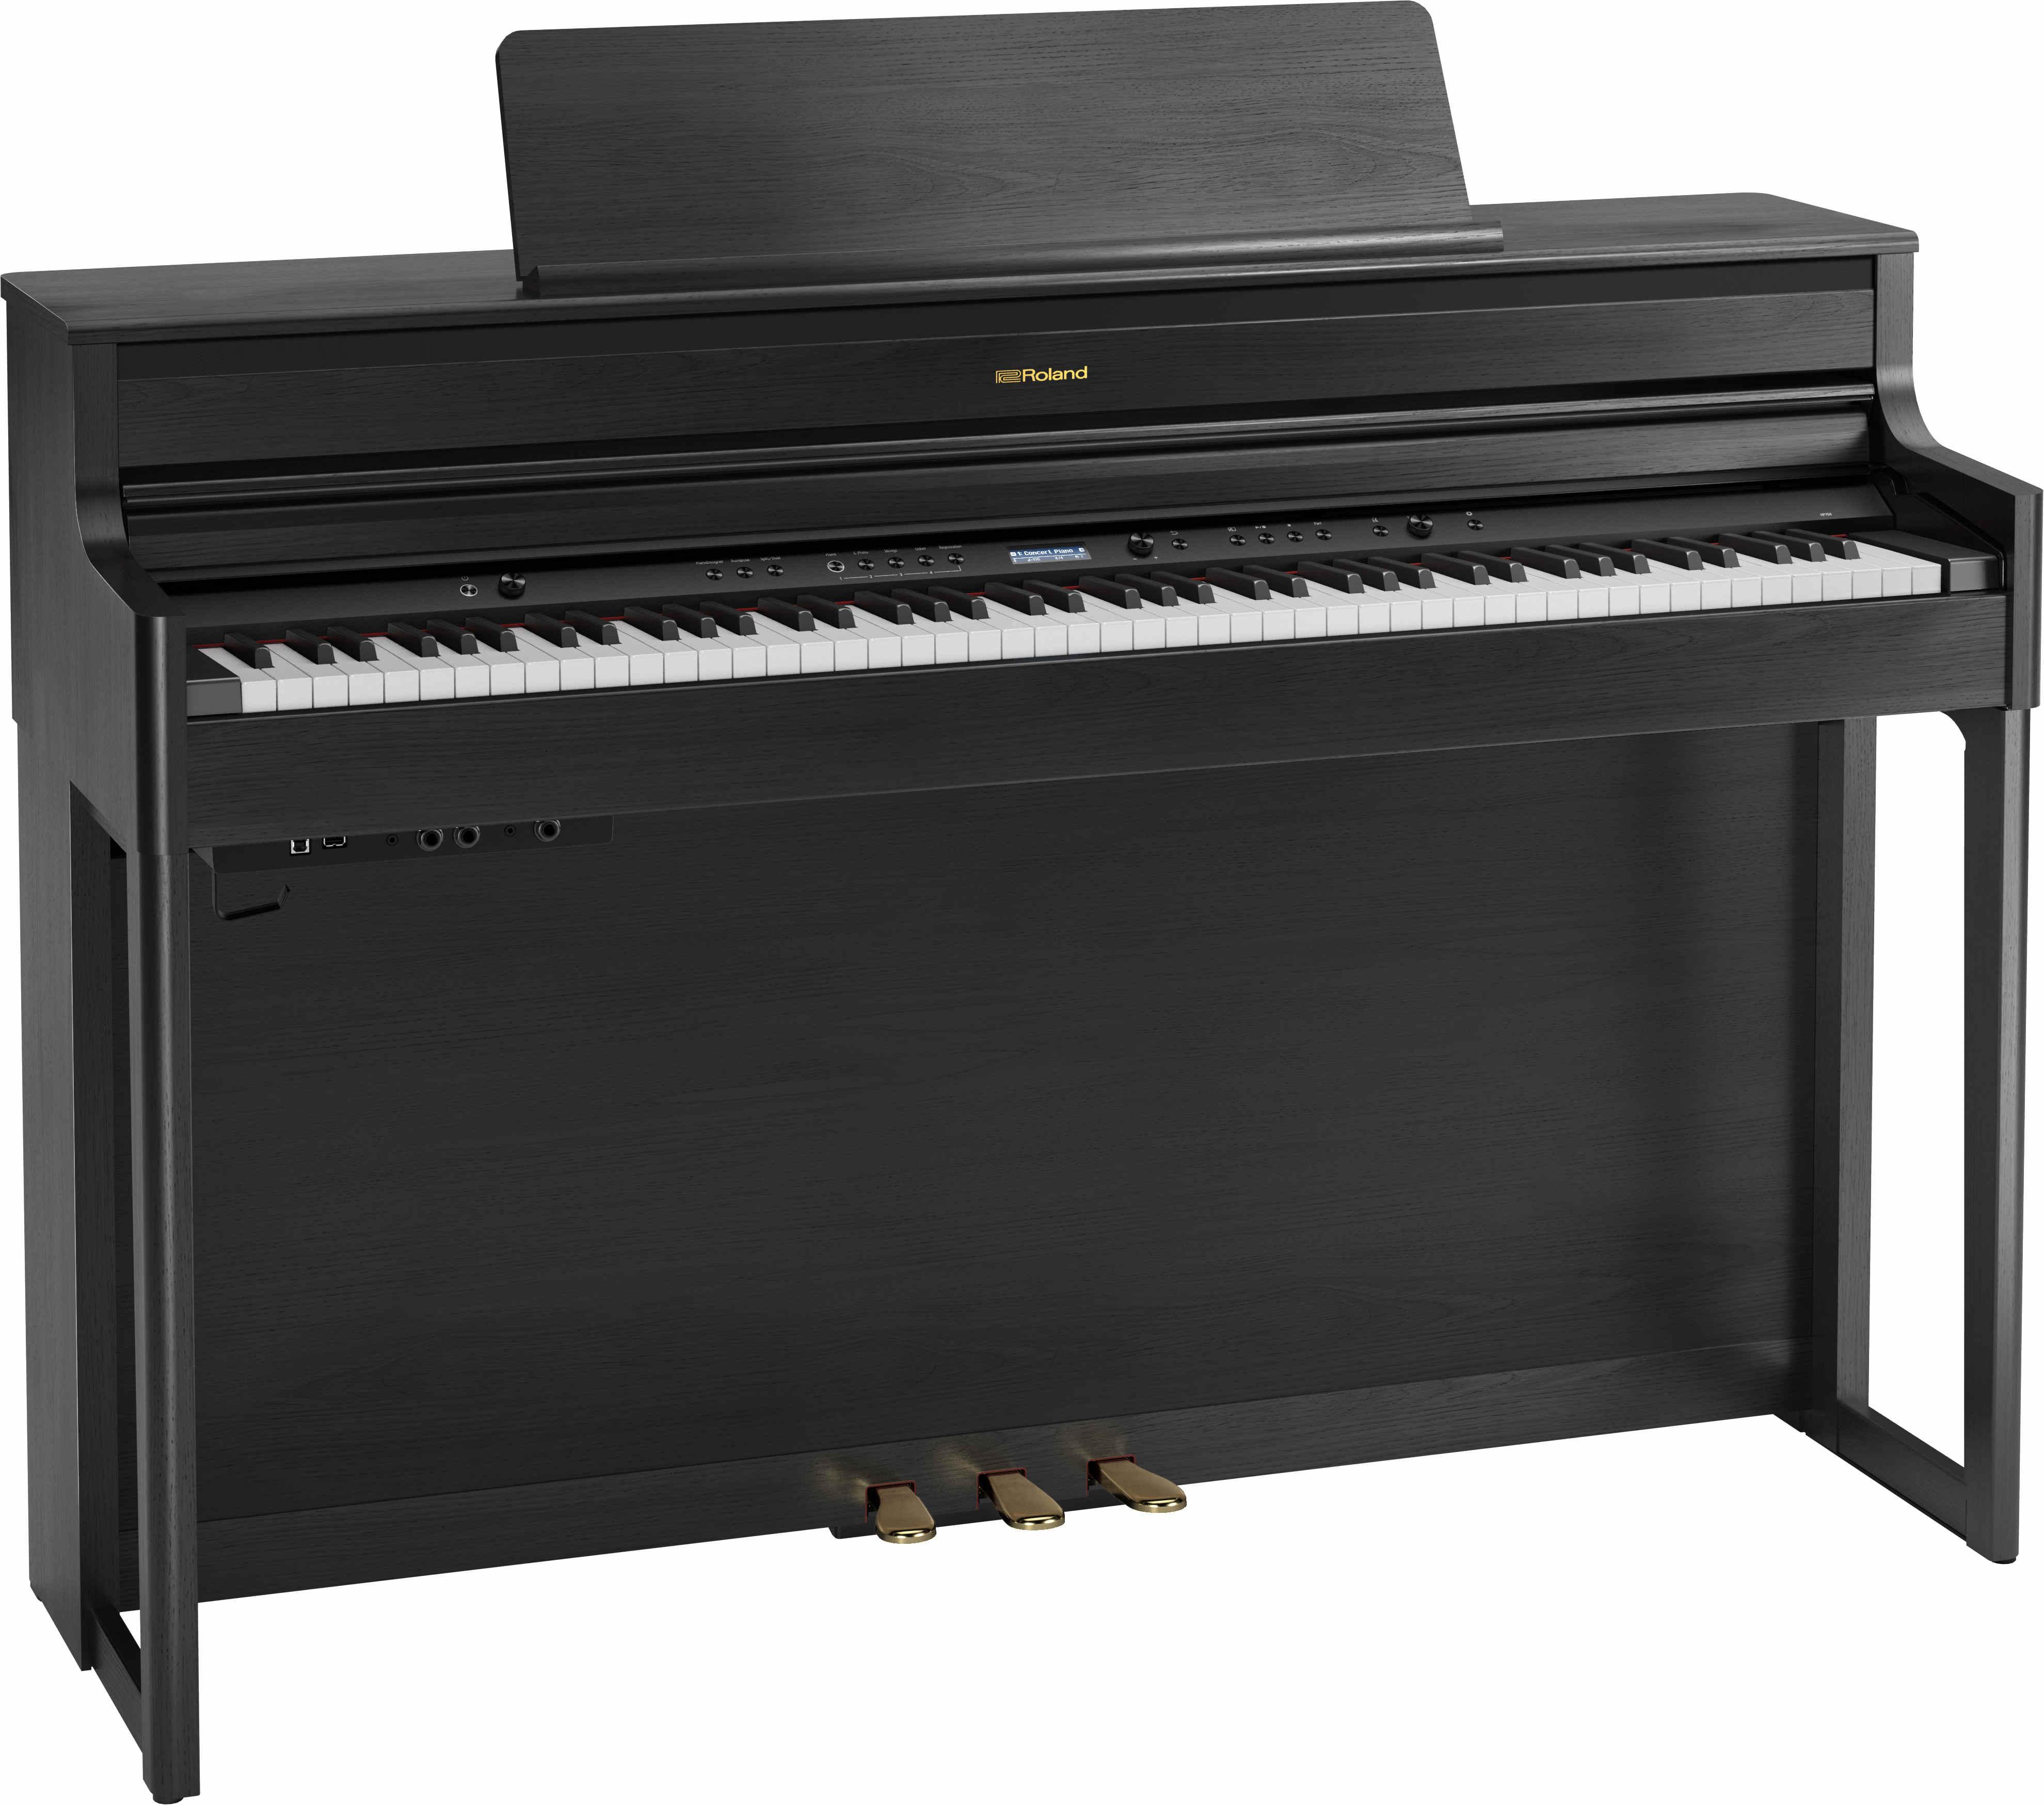 Roland HP-704 Charcoal Black